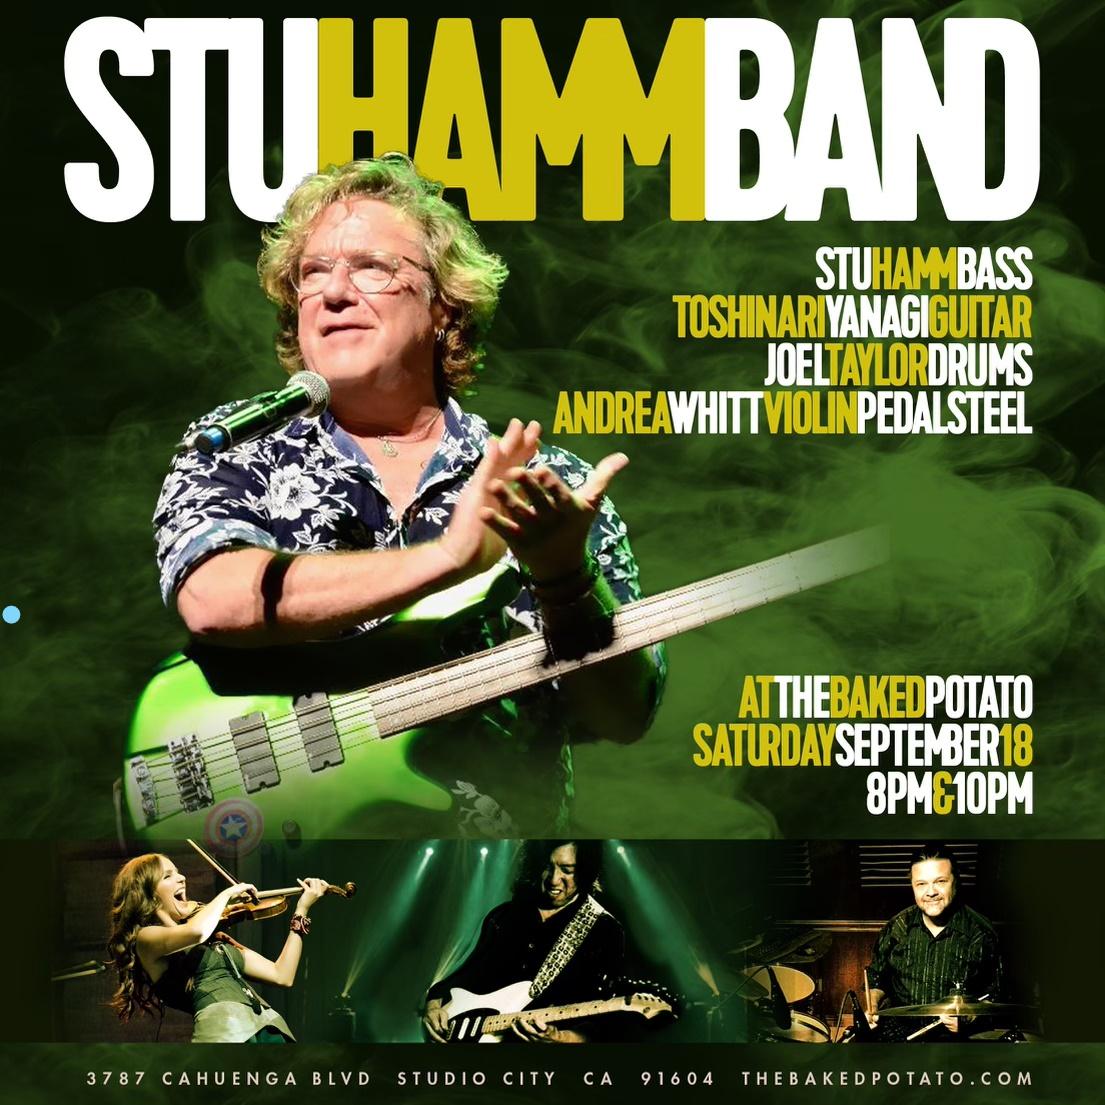 STU HAMM BAND - Saturday, September 18, 2021